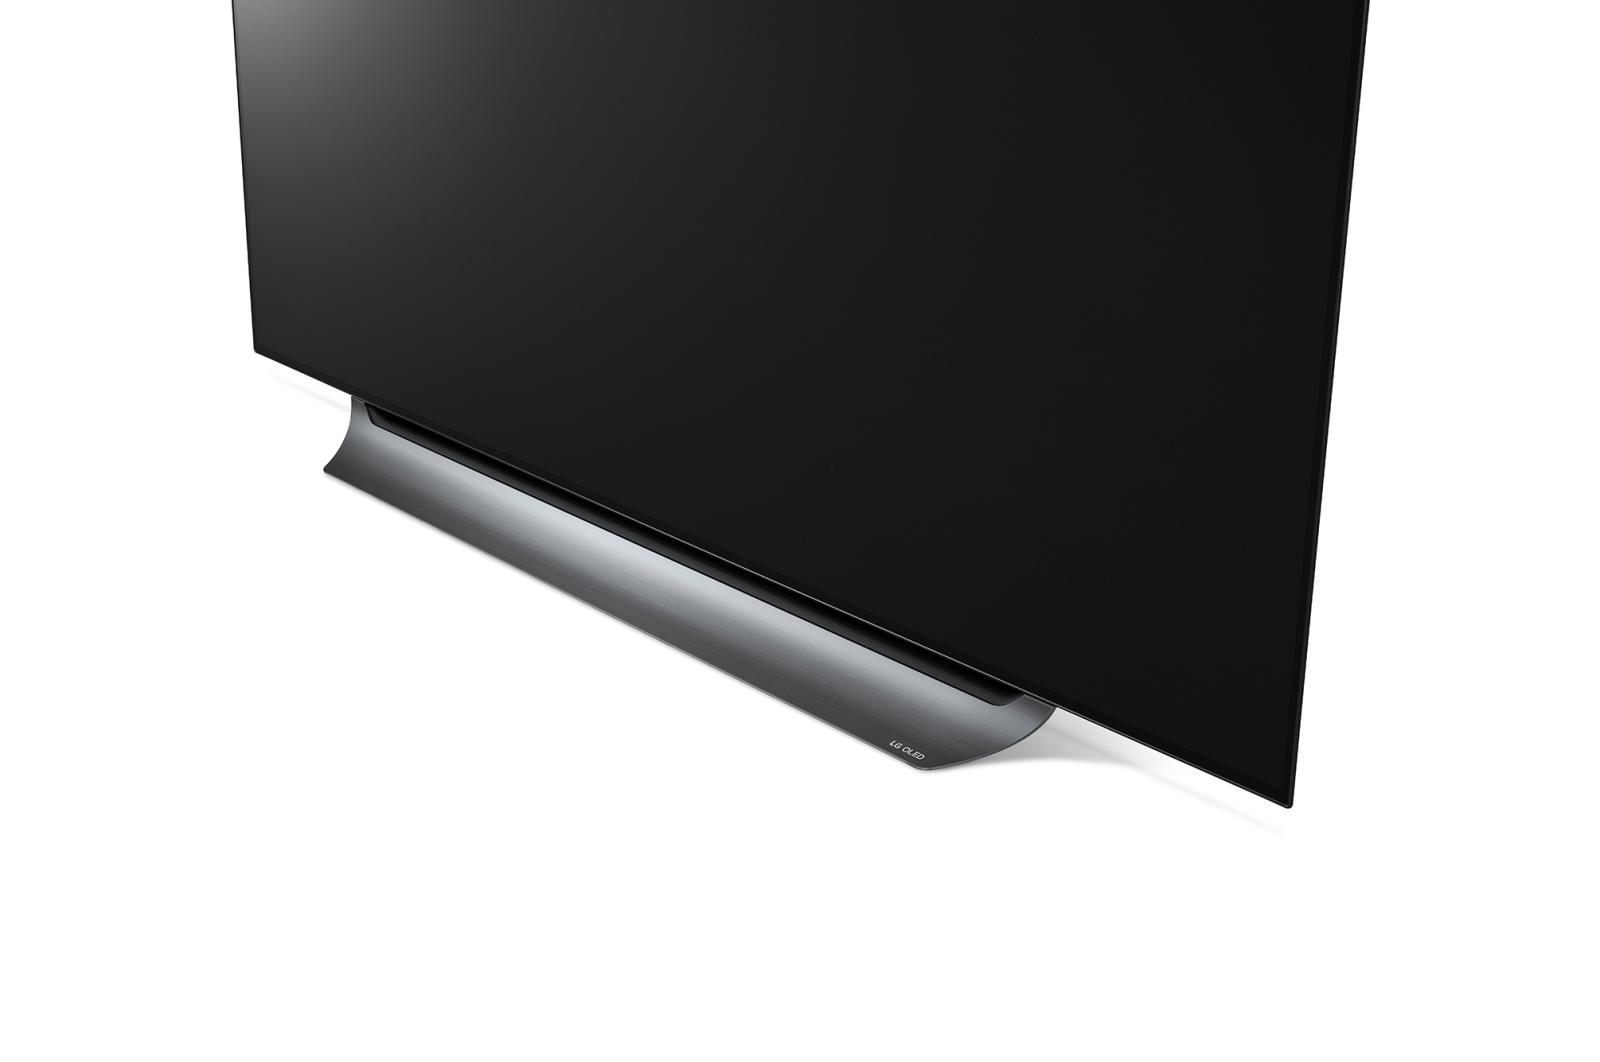 Smart Tivi OLED LG 65 inch 65C8PTA, 4K Cinema HDR (Model 2018) chân đế